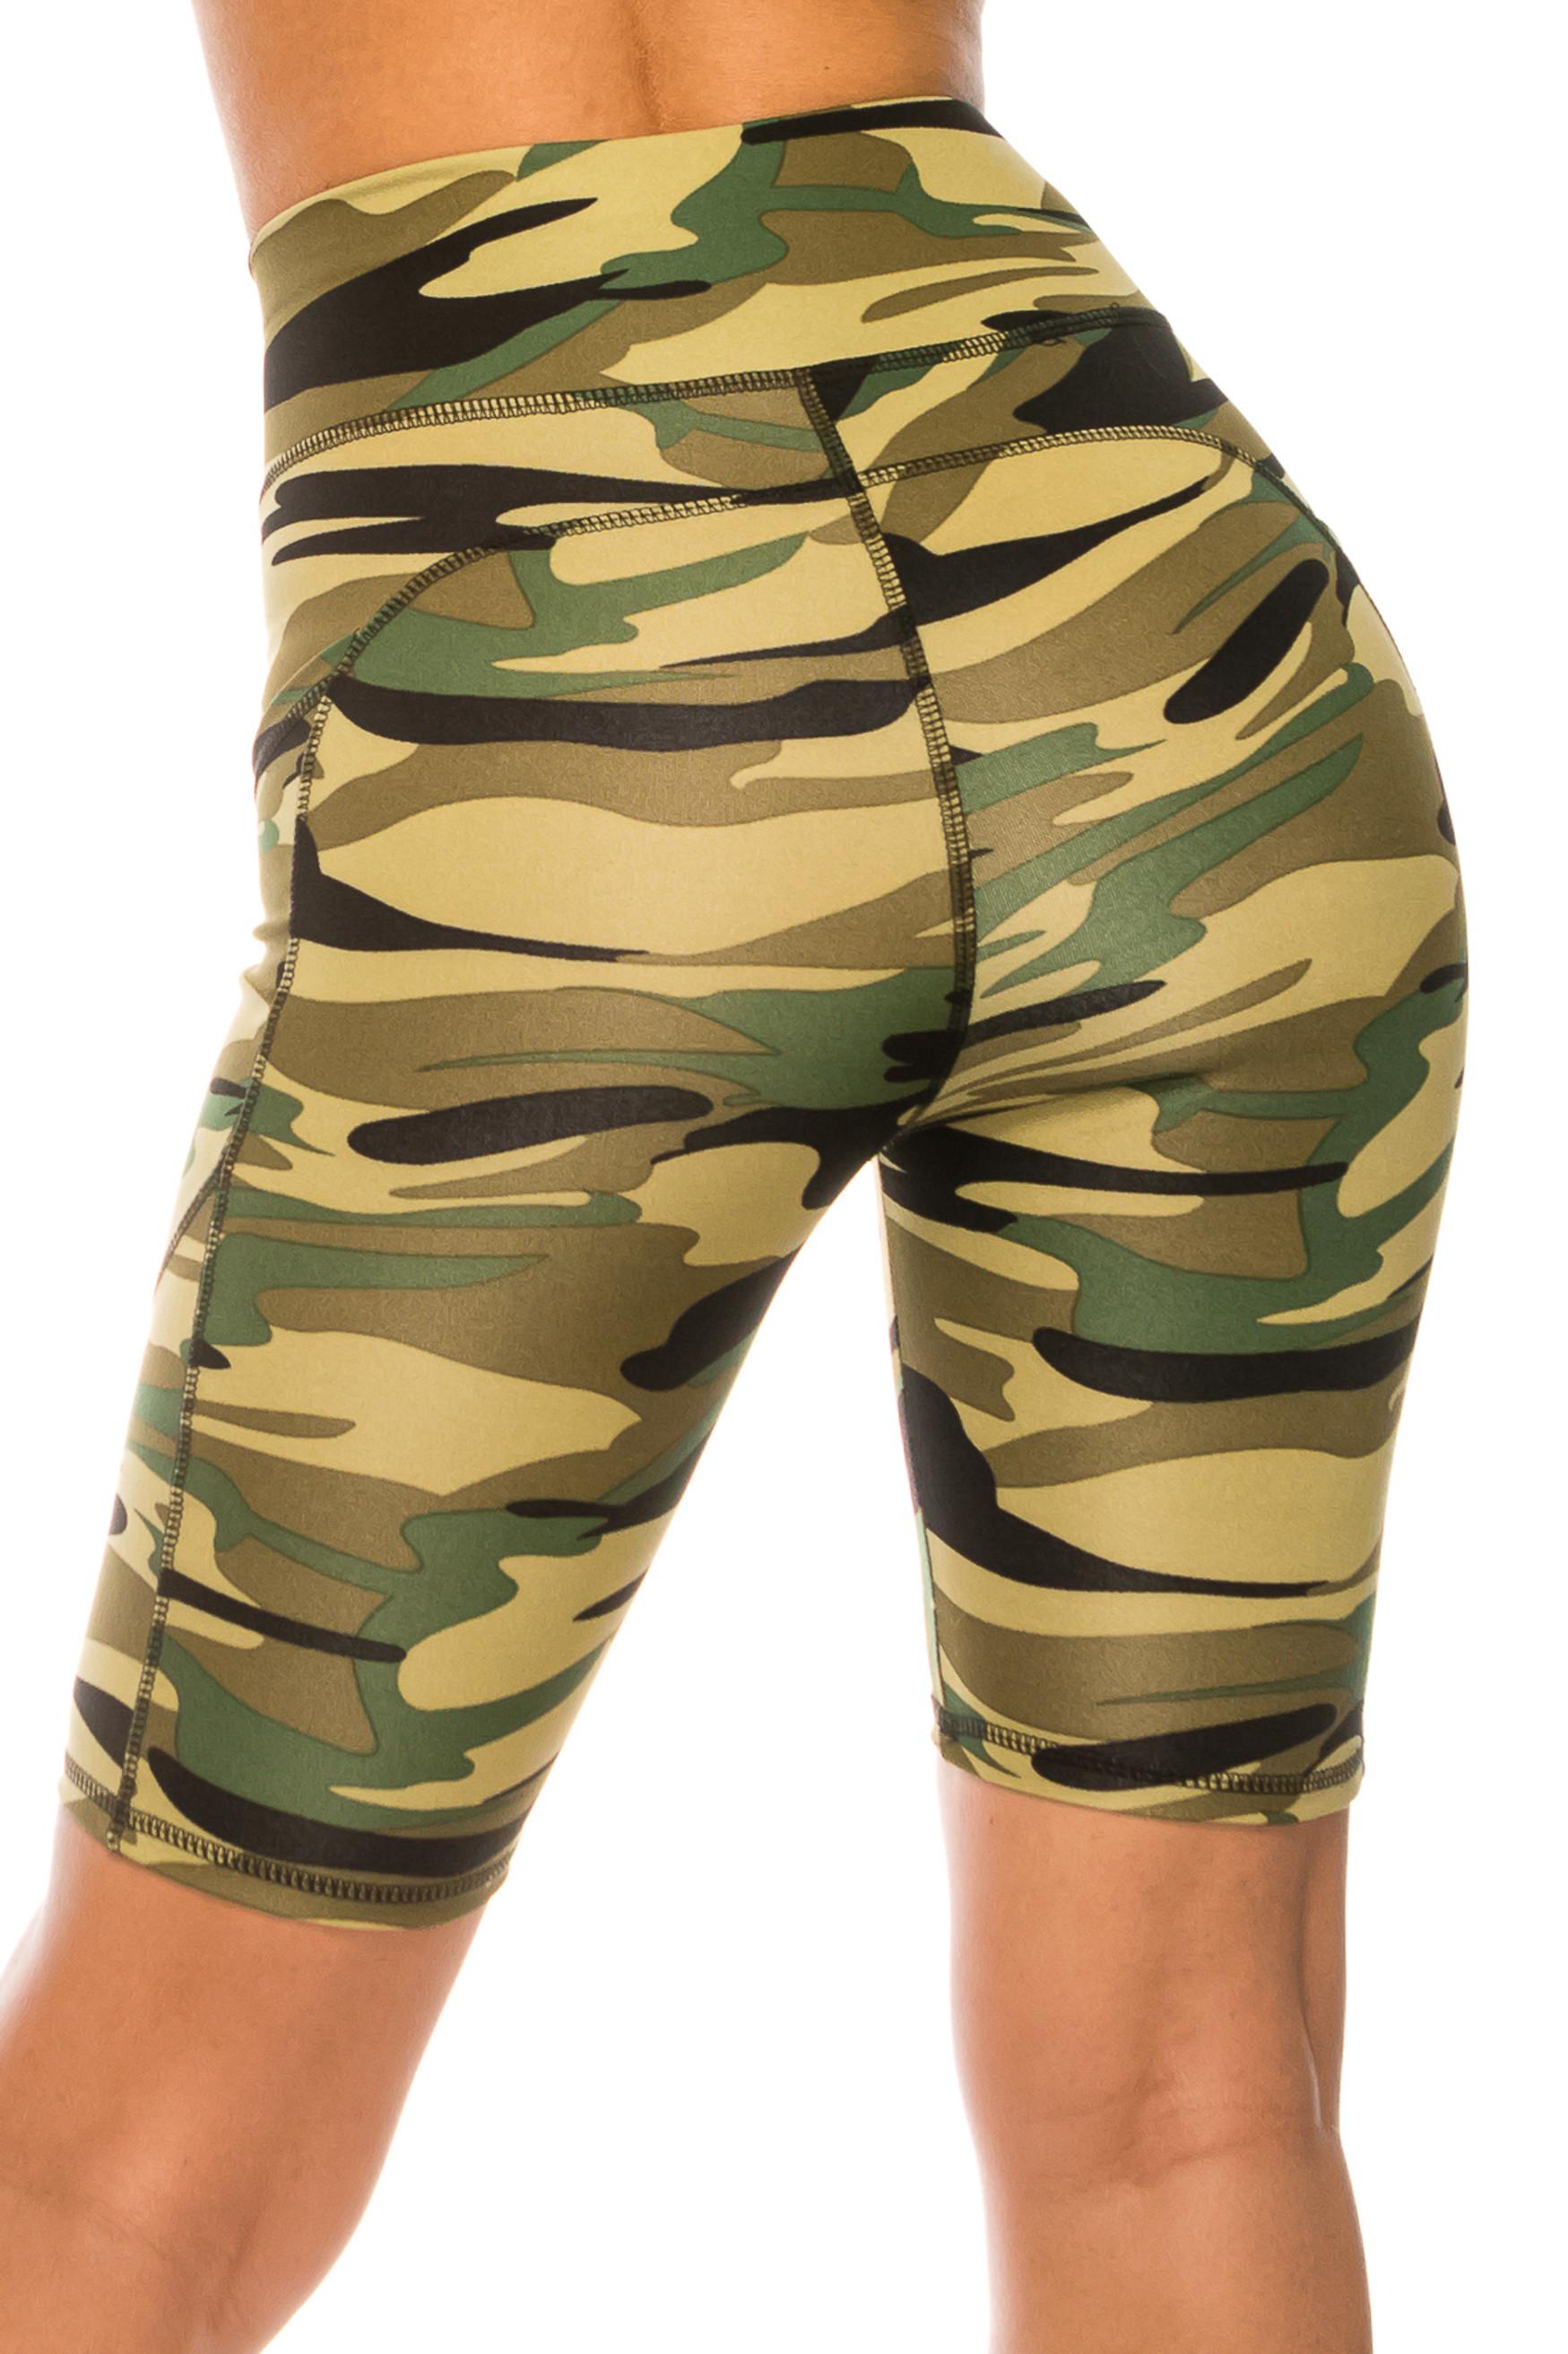 Green Camouflage High Waist Sport Biker Shorts with Pockets